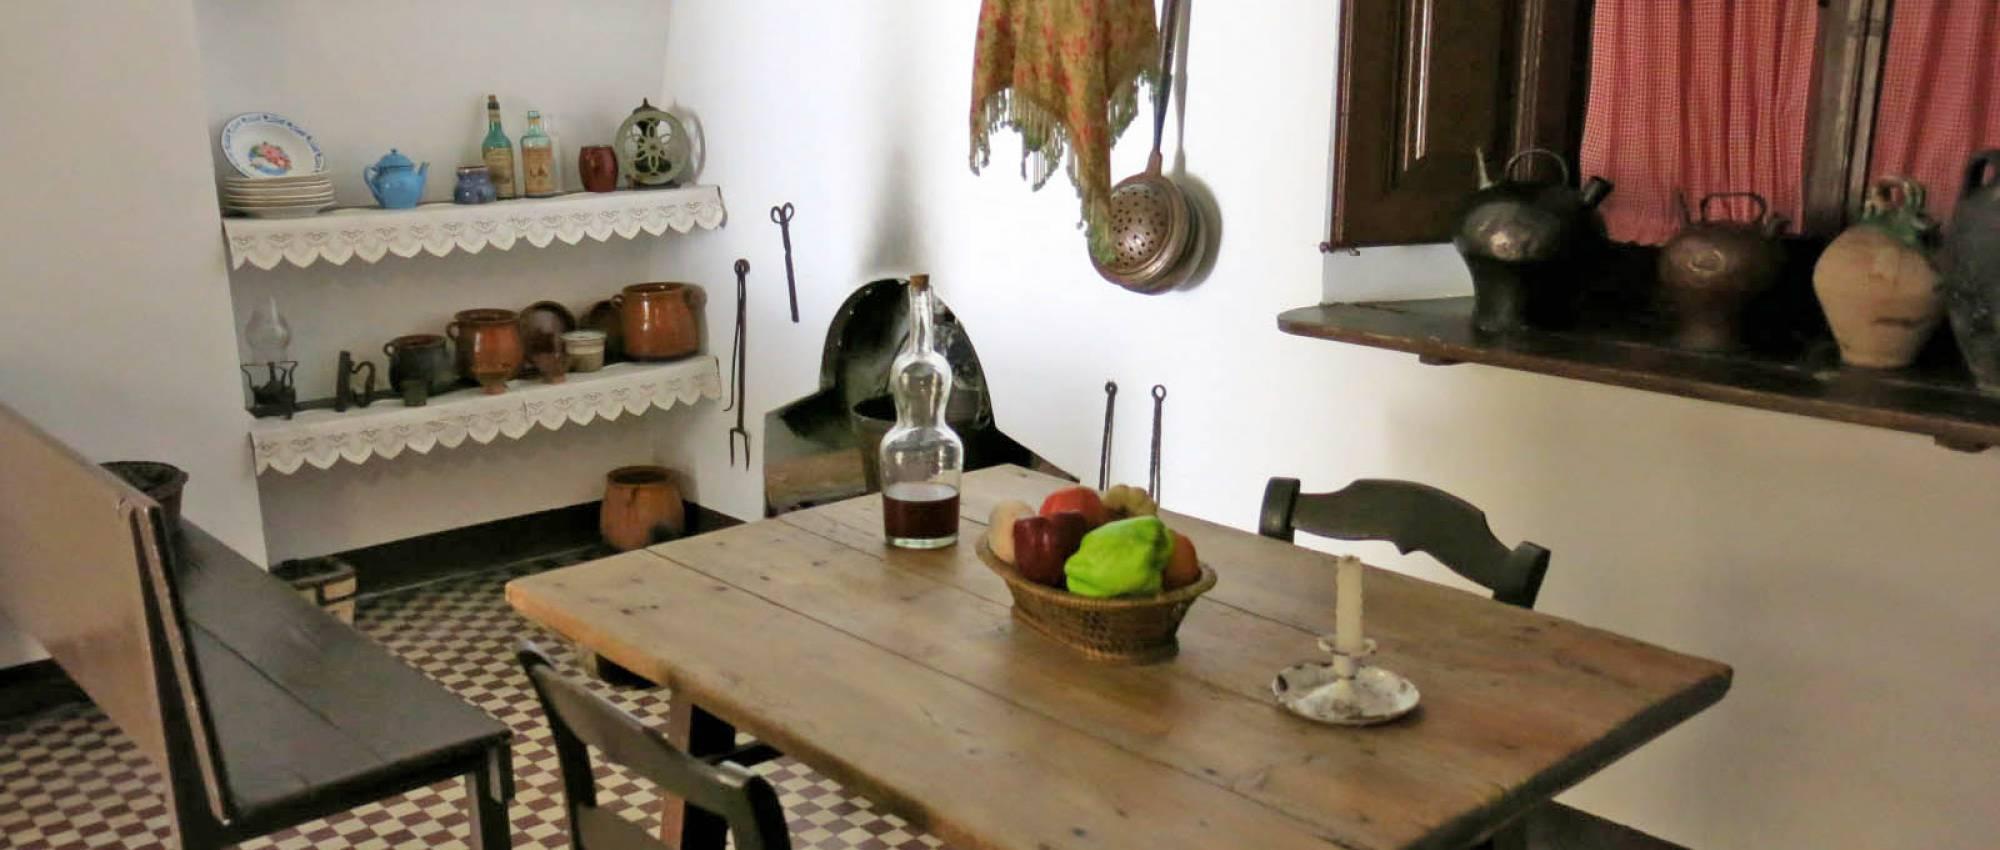 Interior de la casa Prat de la Riba. Enfo / Wikimedia Commons. CC BY-SA 3.0